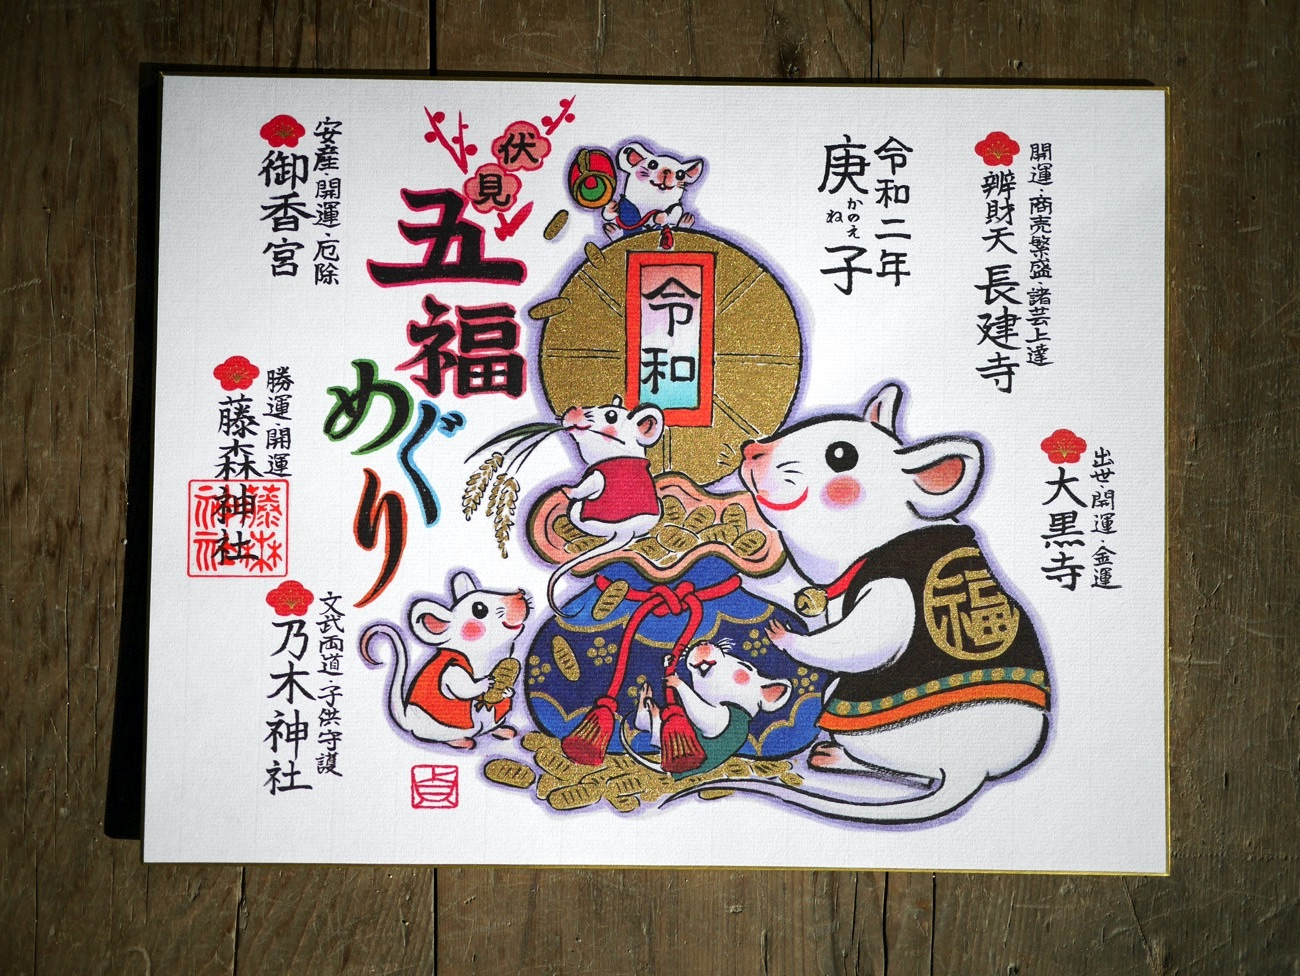 藤森神社の御朱印(左)